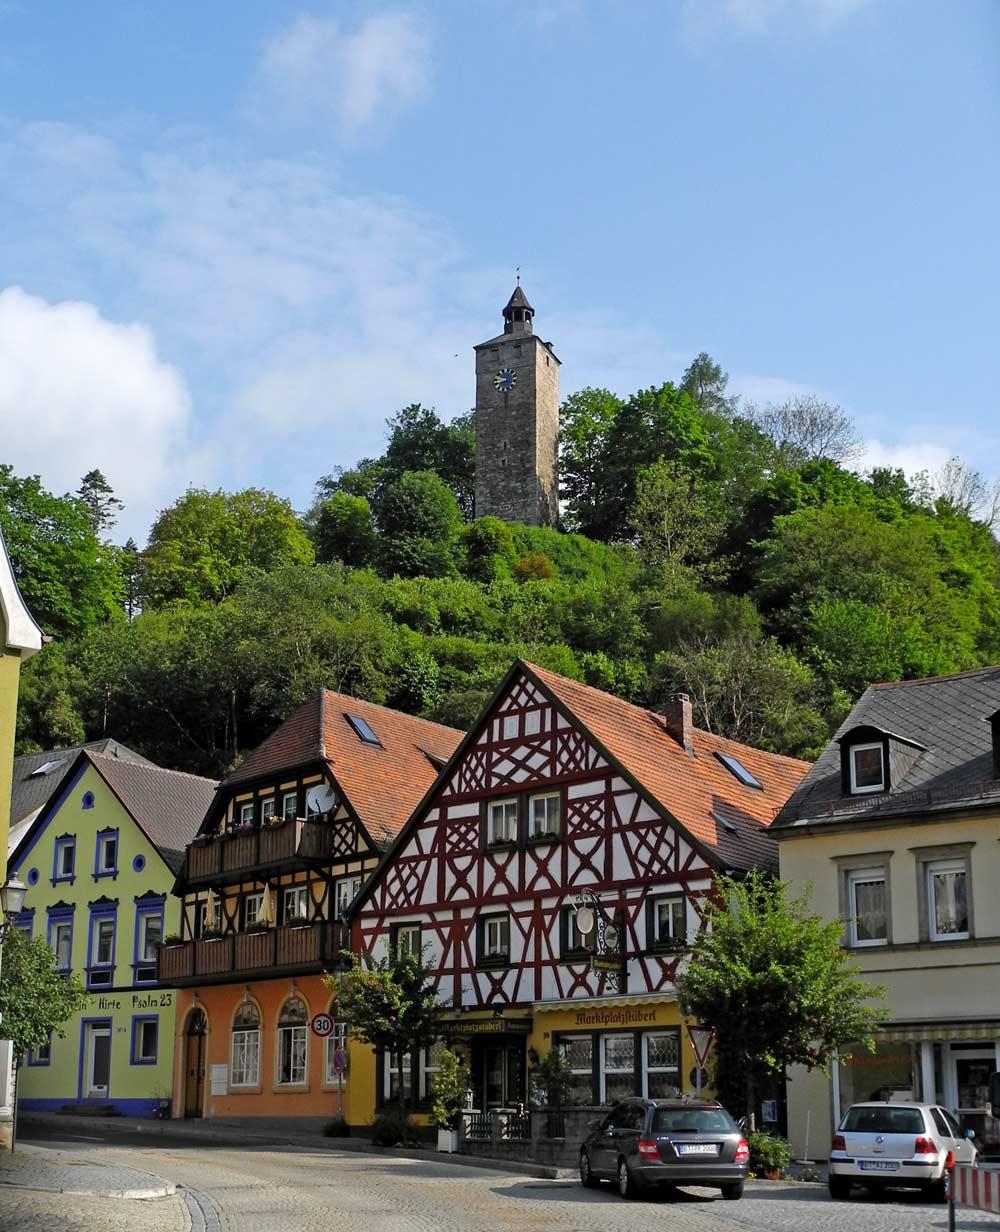 Bad Berneck mit dem Burgturm des Alten Schlosses